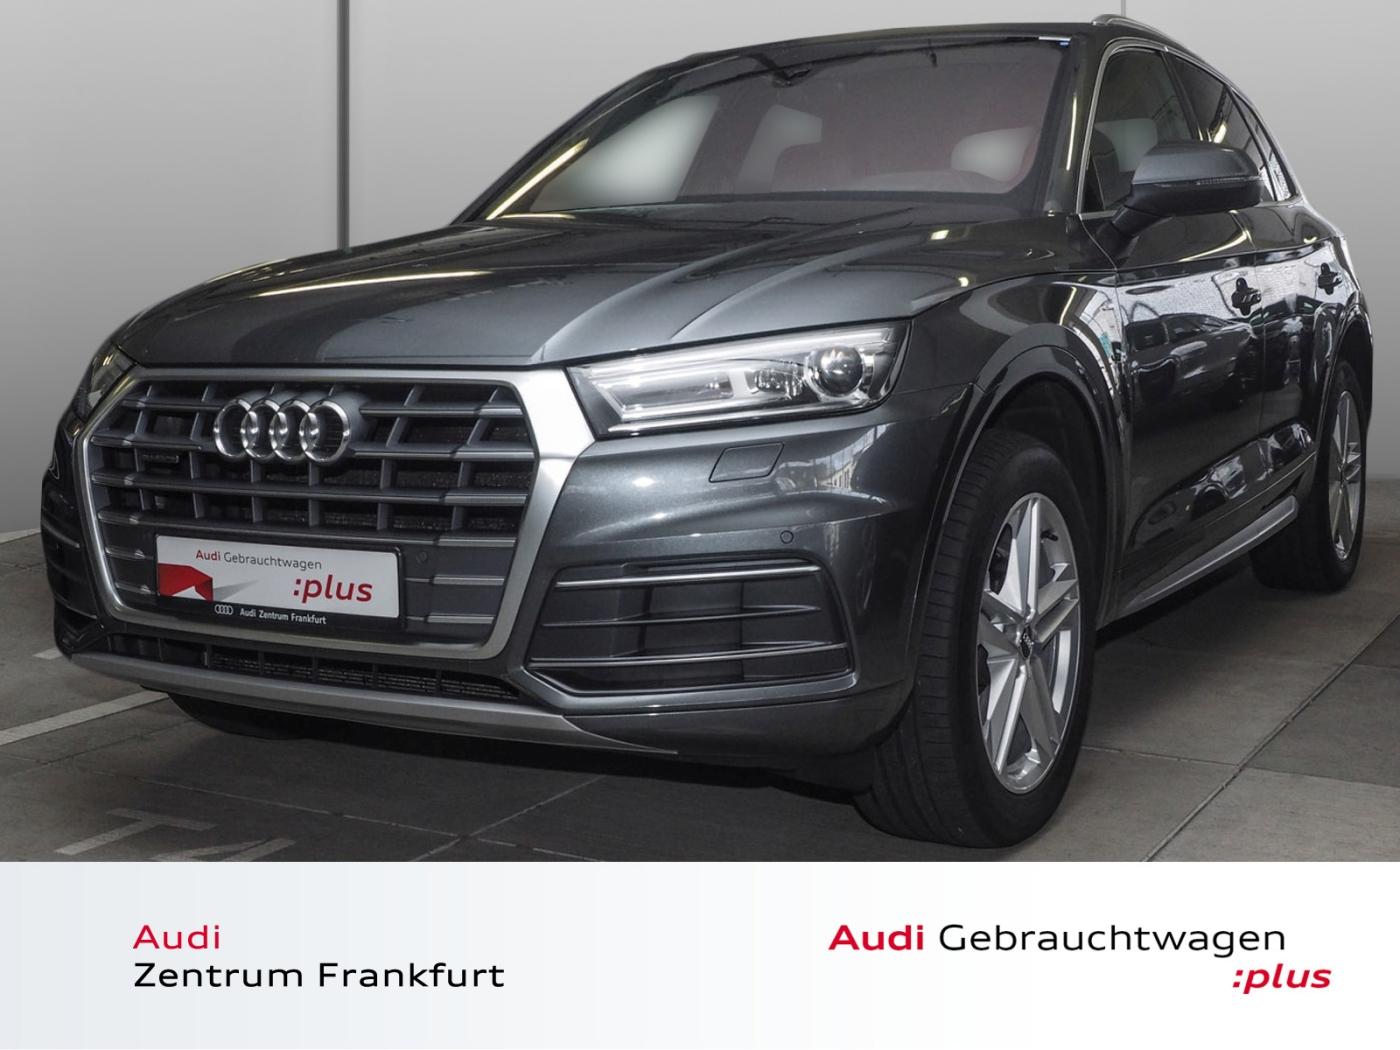 Audi Q5 2.0 TDI quattro S tronic S line Navi AHK PDC, Jahr 2017, Diesel